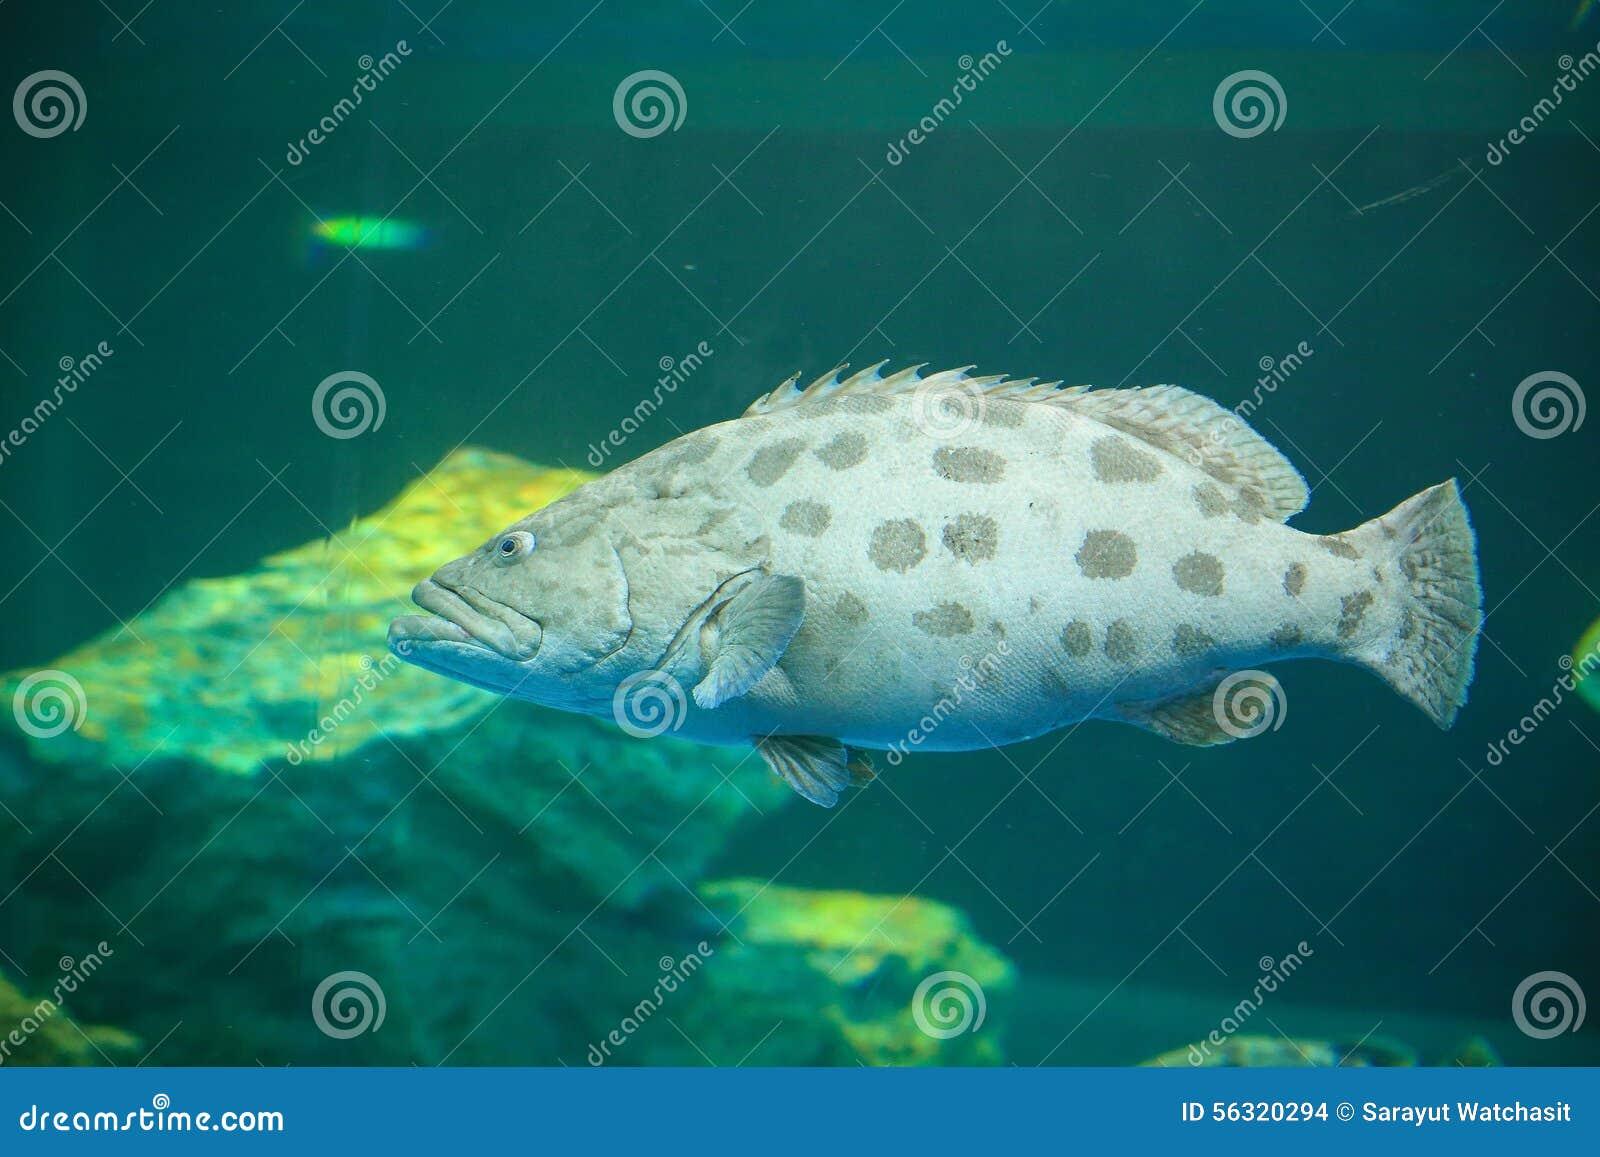 Potato grouper stock photo  Image of malaysia, bass, concern